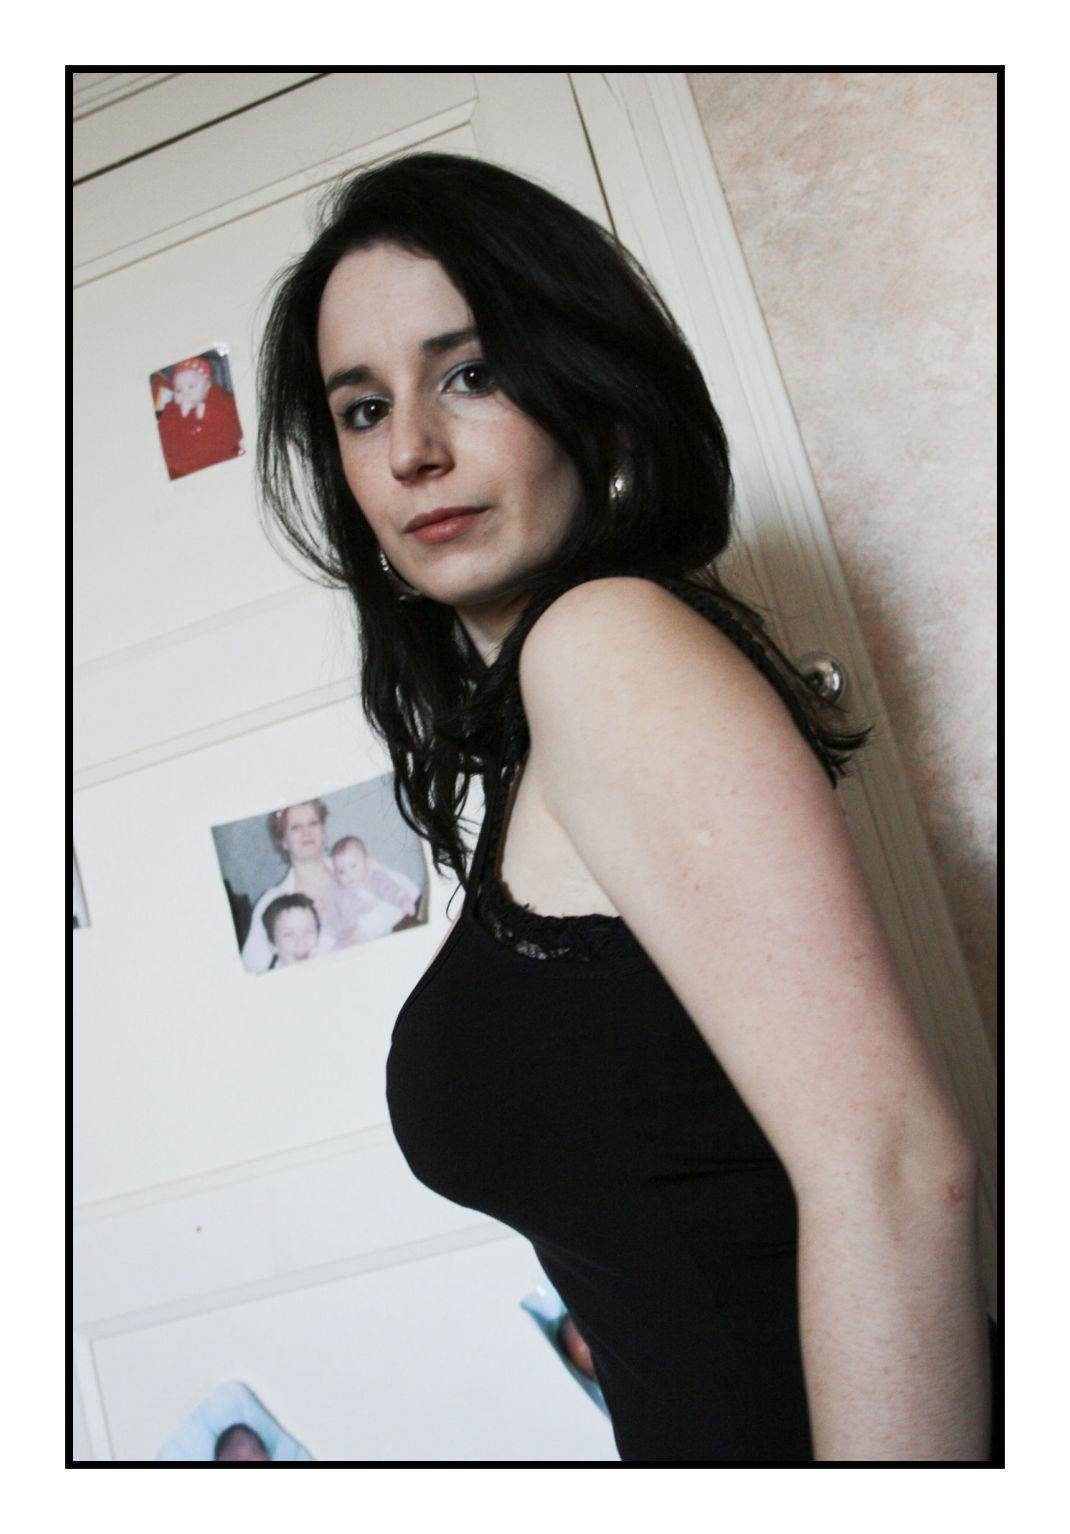 ... LA CHAMBRE DES FILLES ... (11/13)